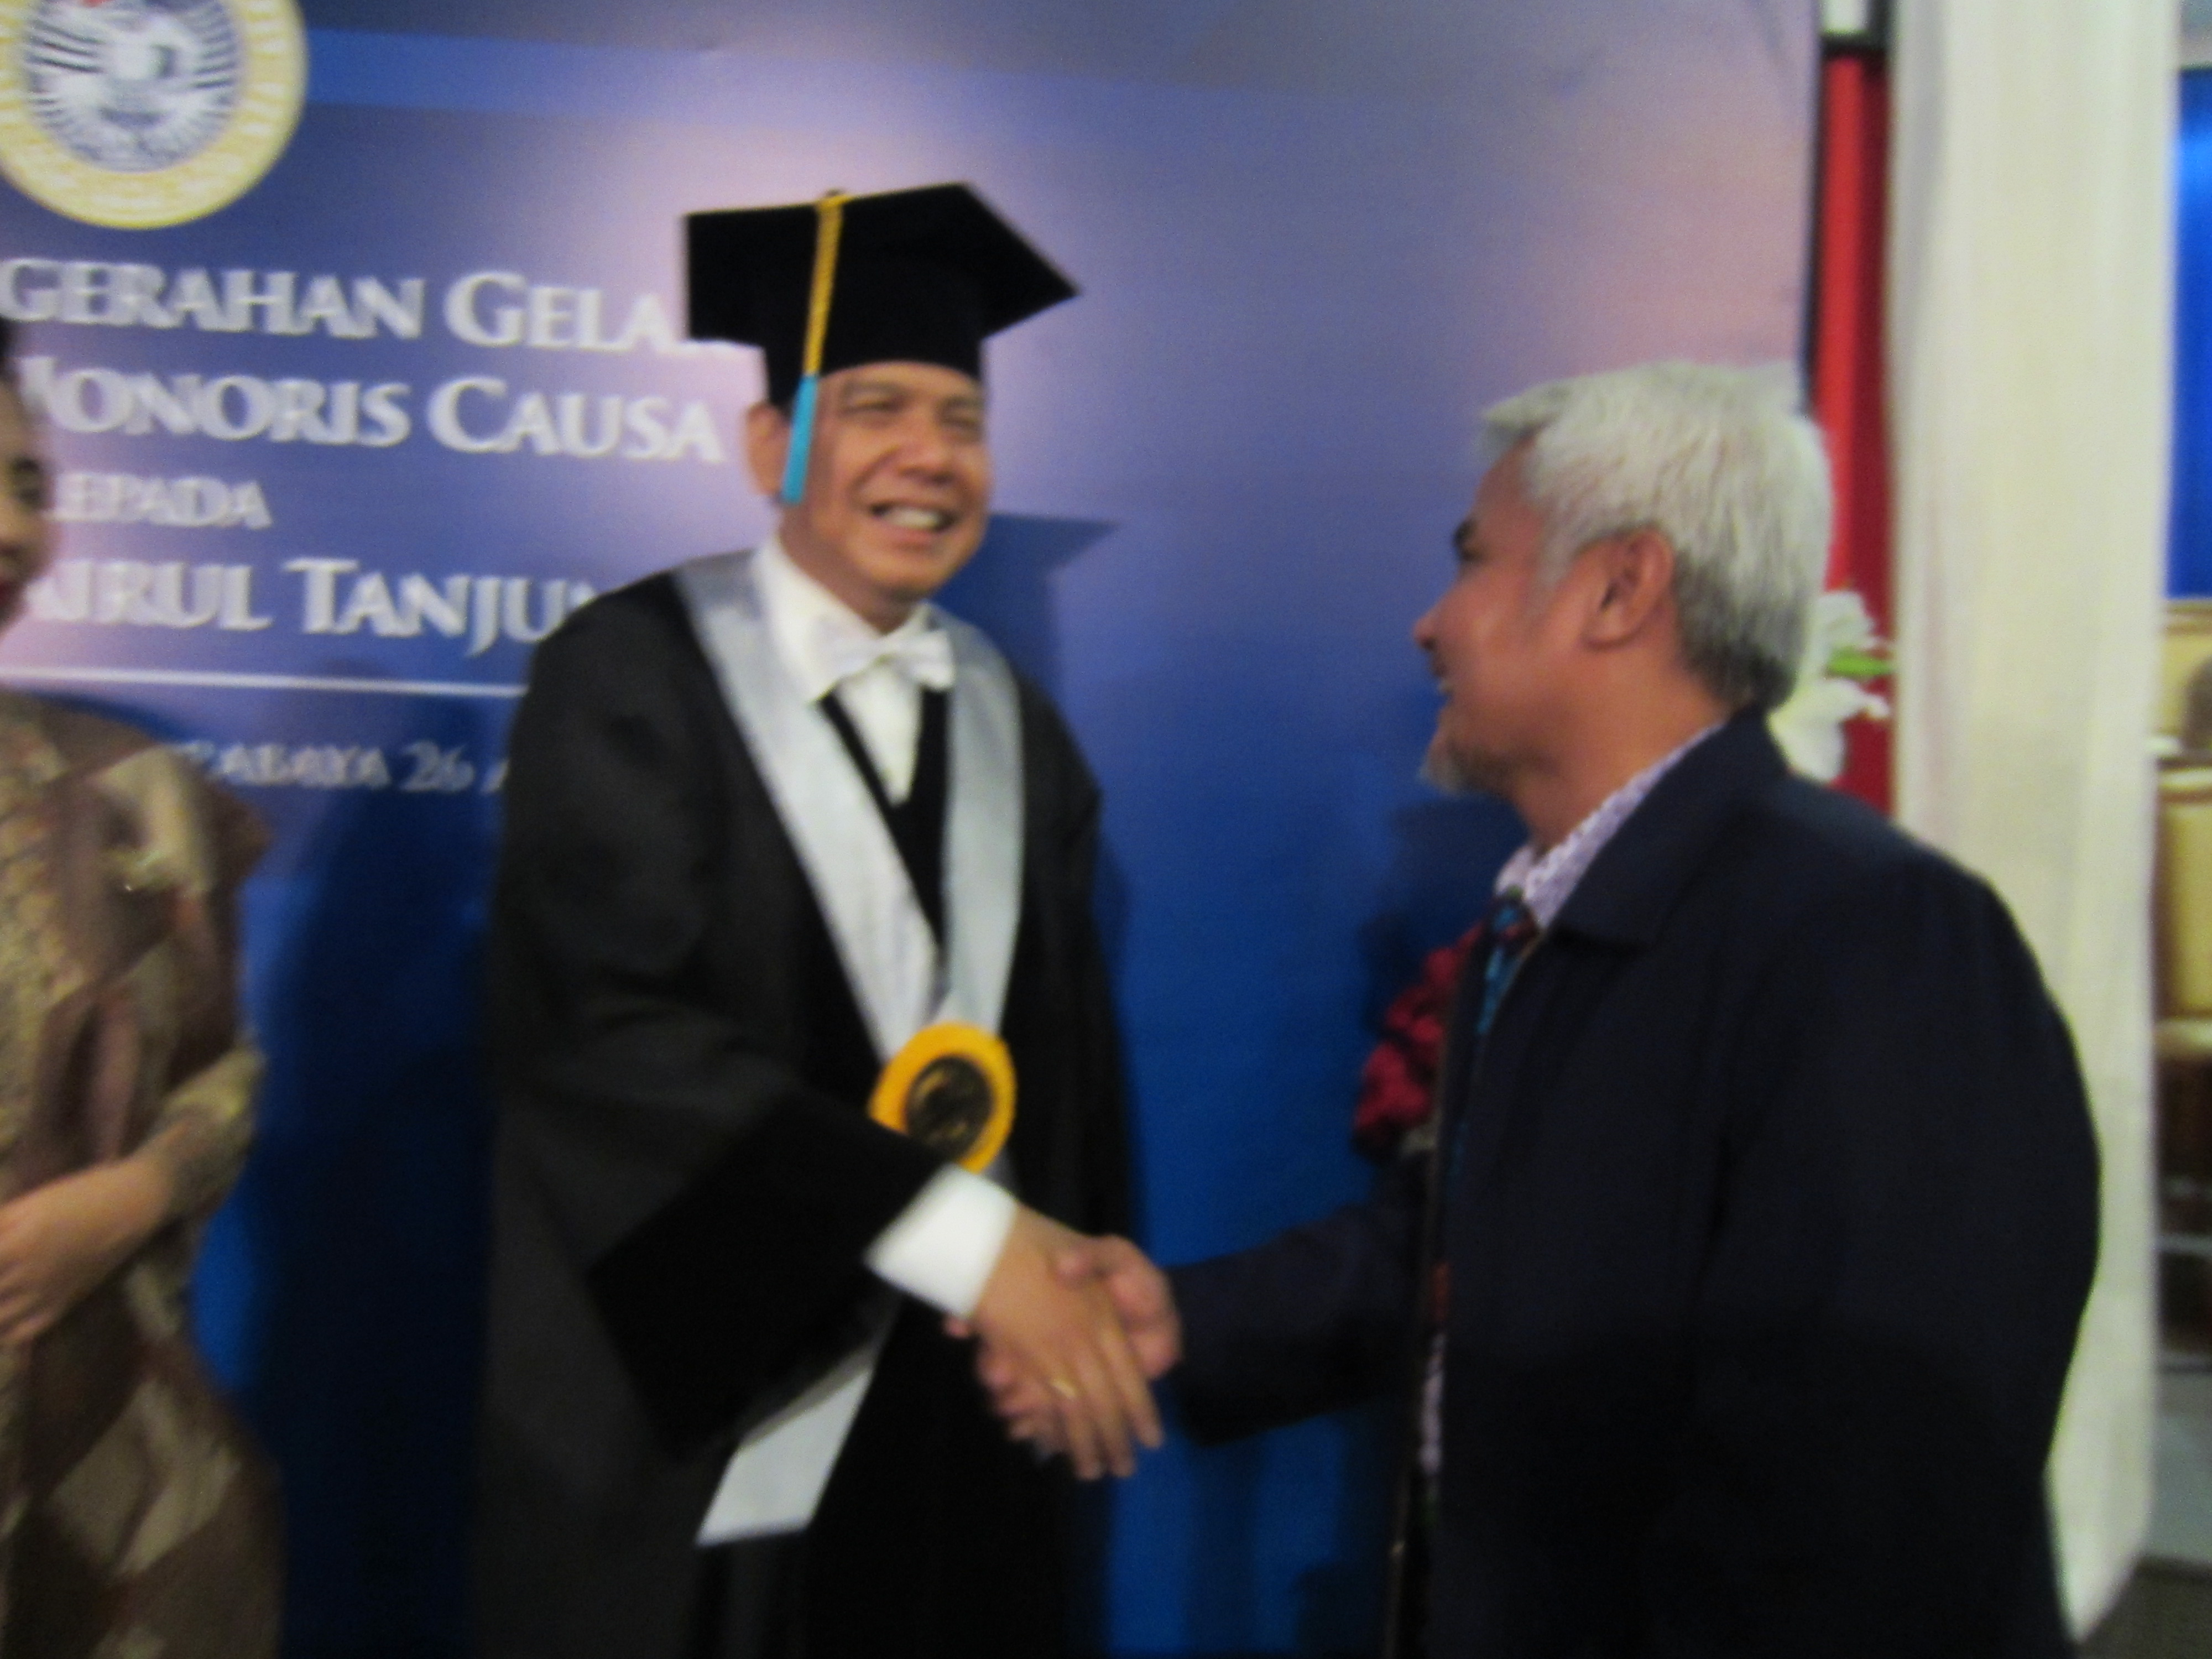 Dr,Choirul Tanjung